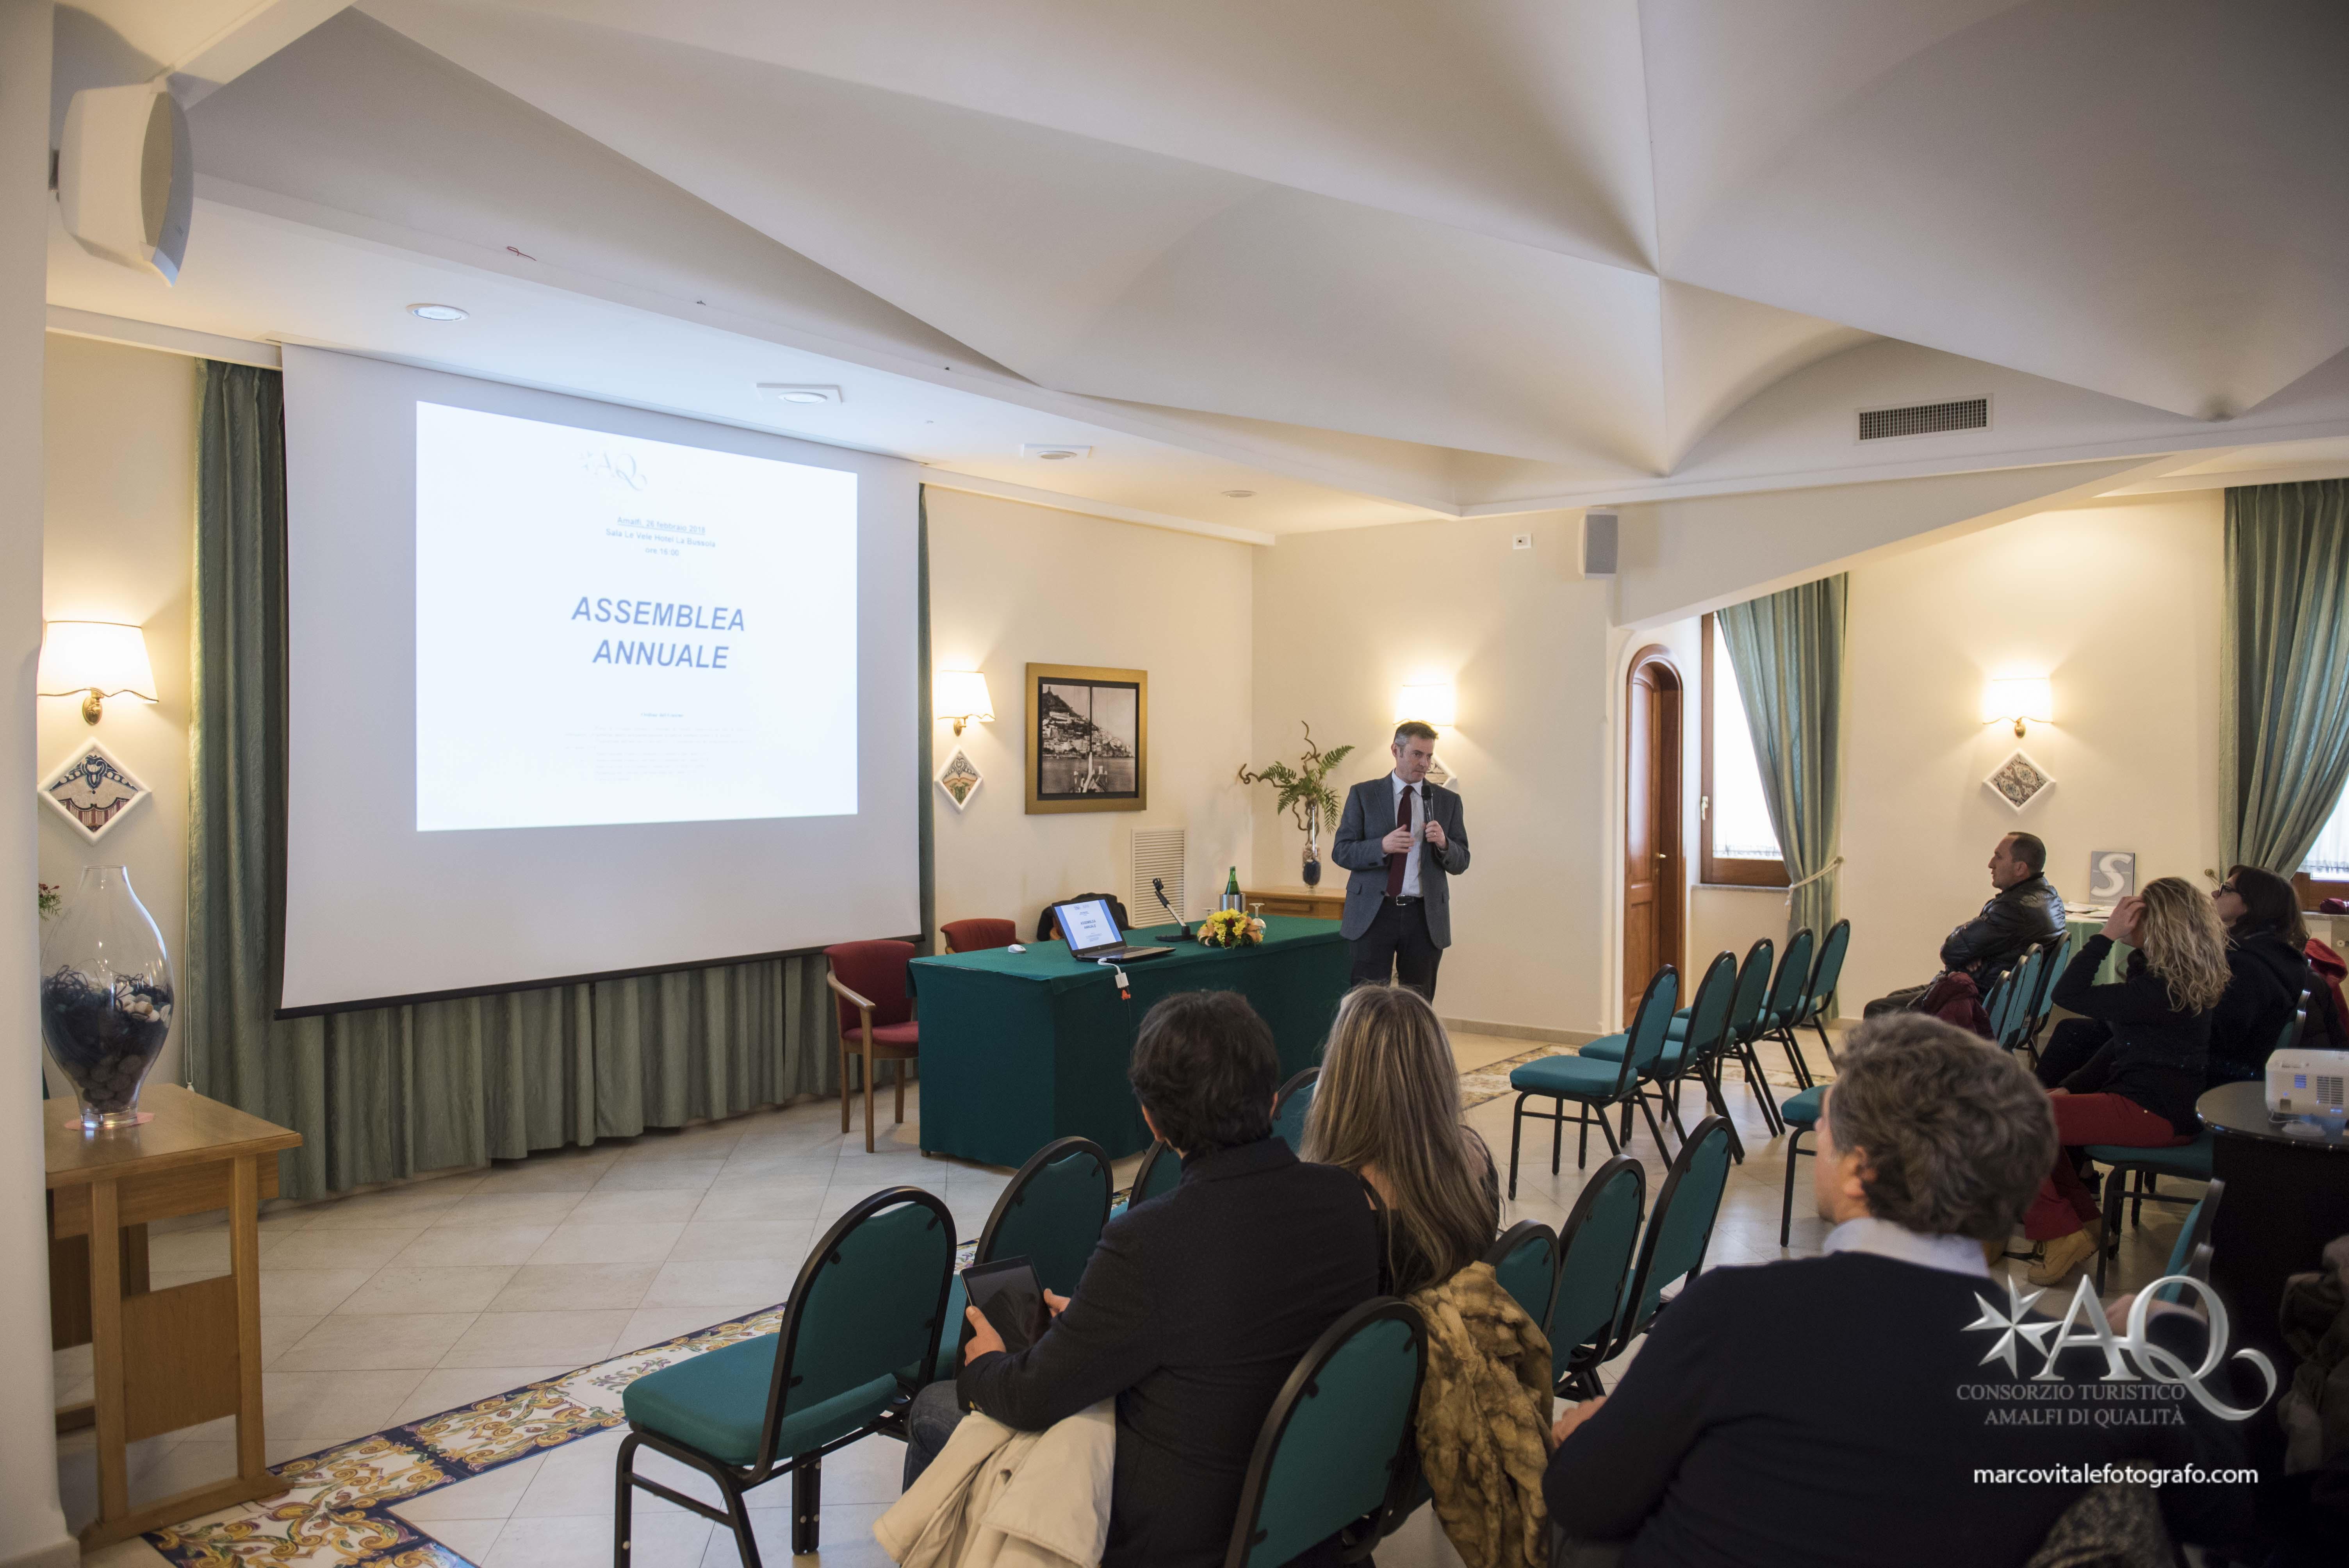 Fotografo per meeting e convegni - Costiera Amalfitana